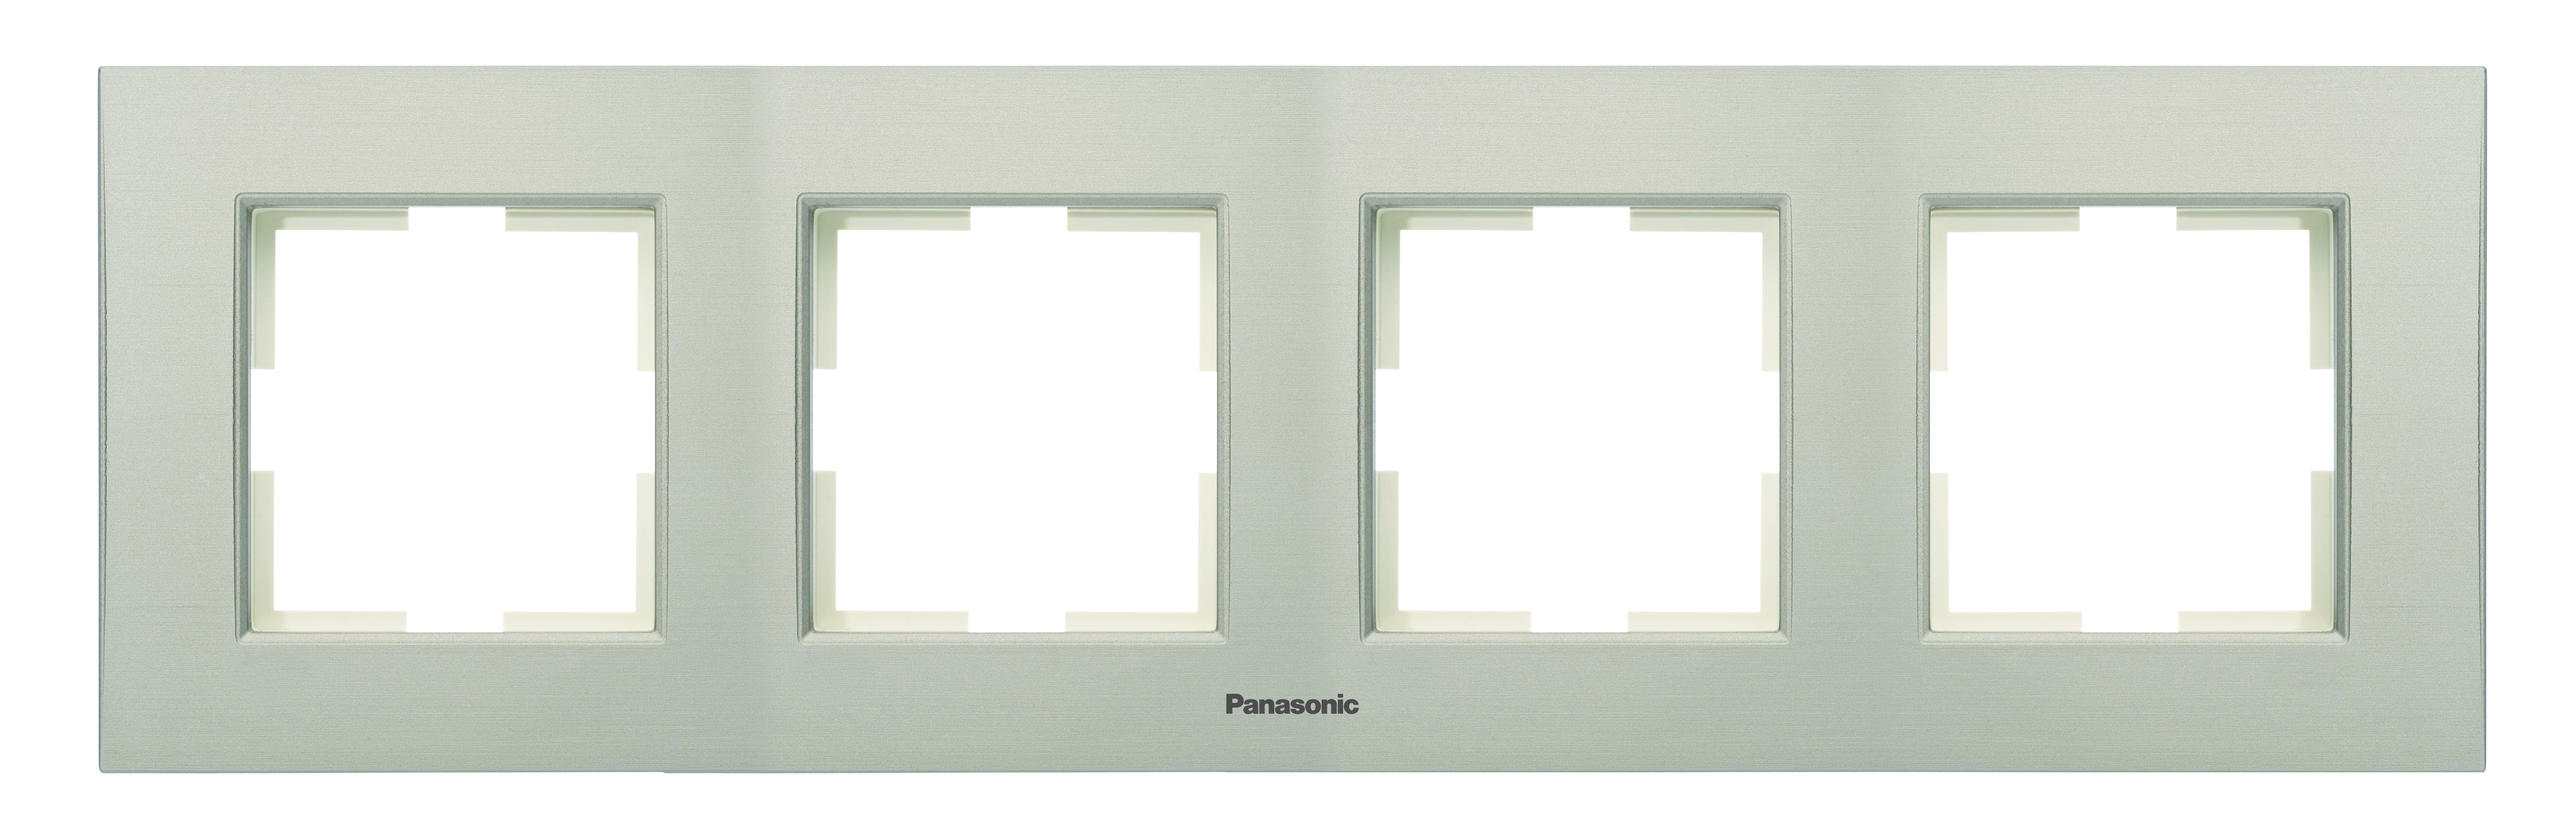 Рамка Panasonic Wktf0803-2dg-res karre plus dg рамка для фото jardo